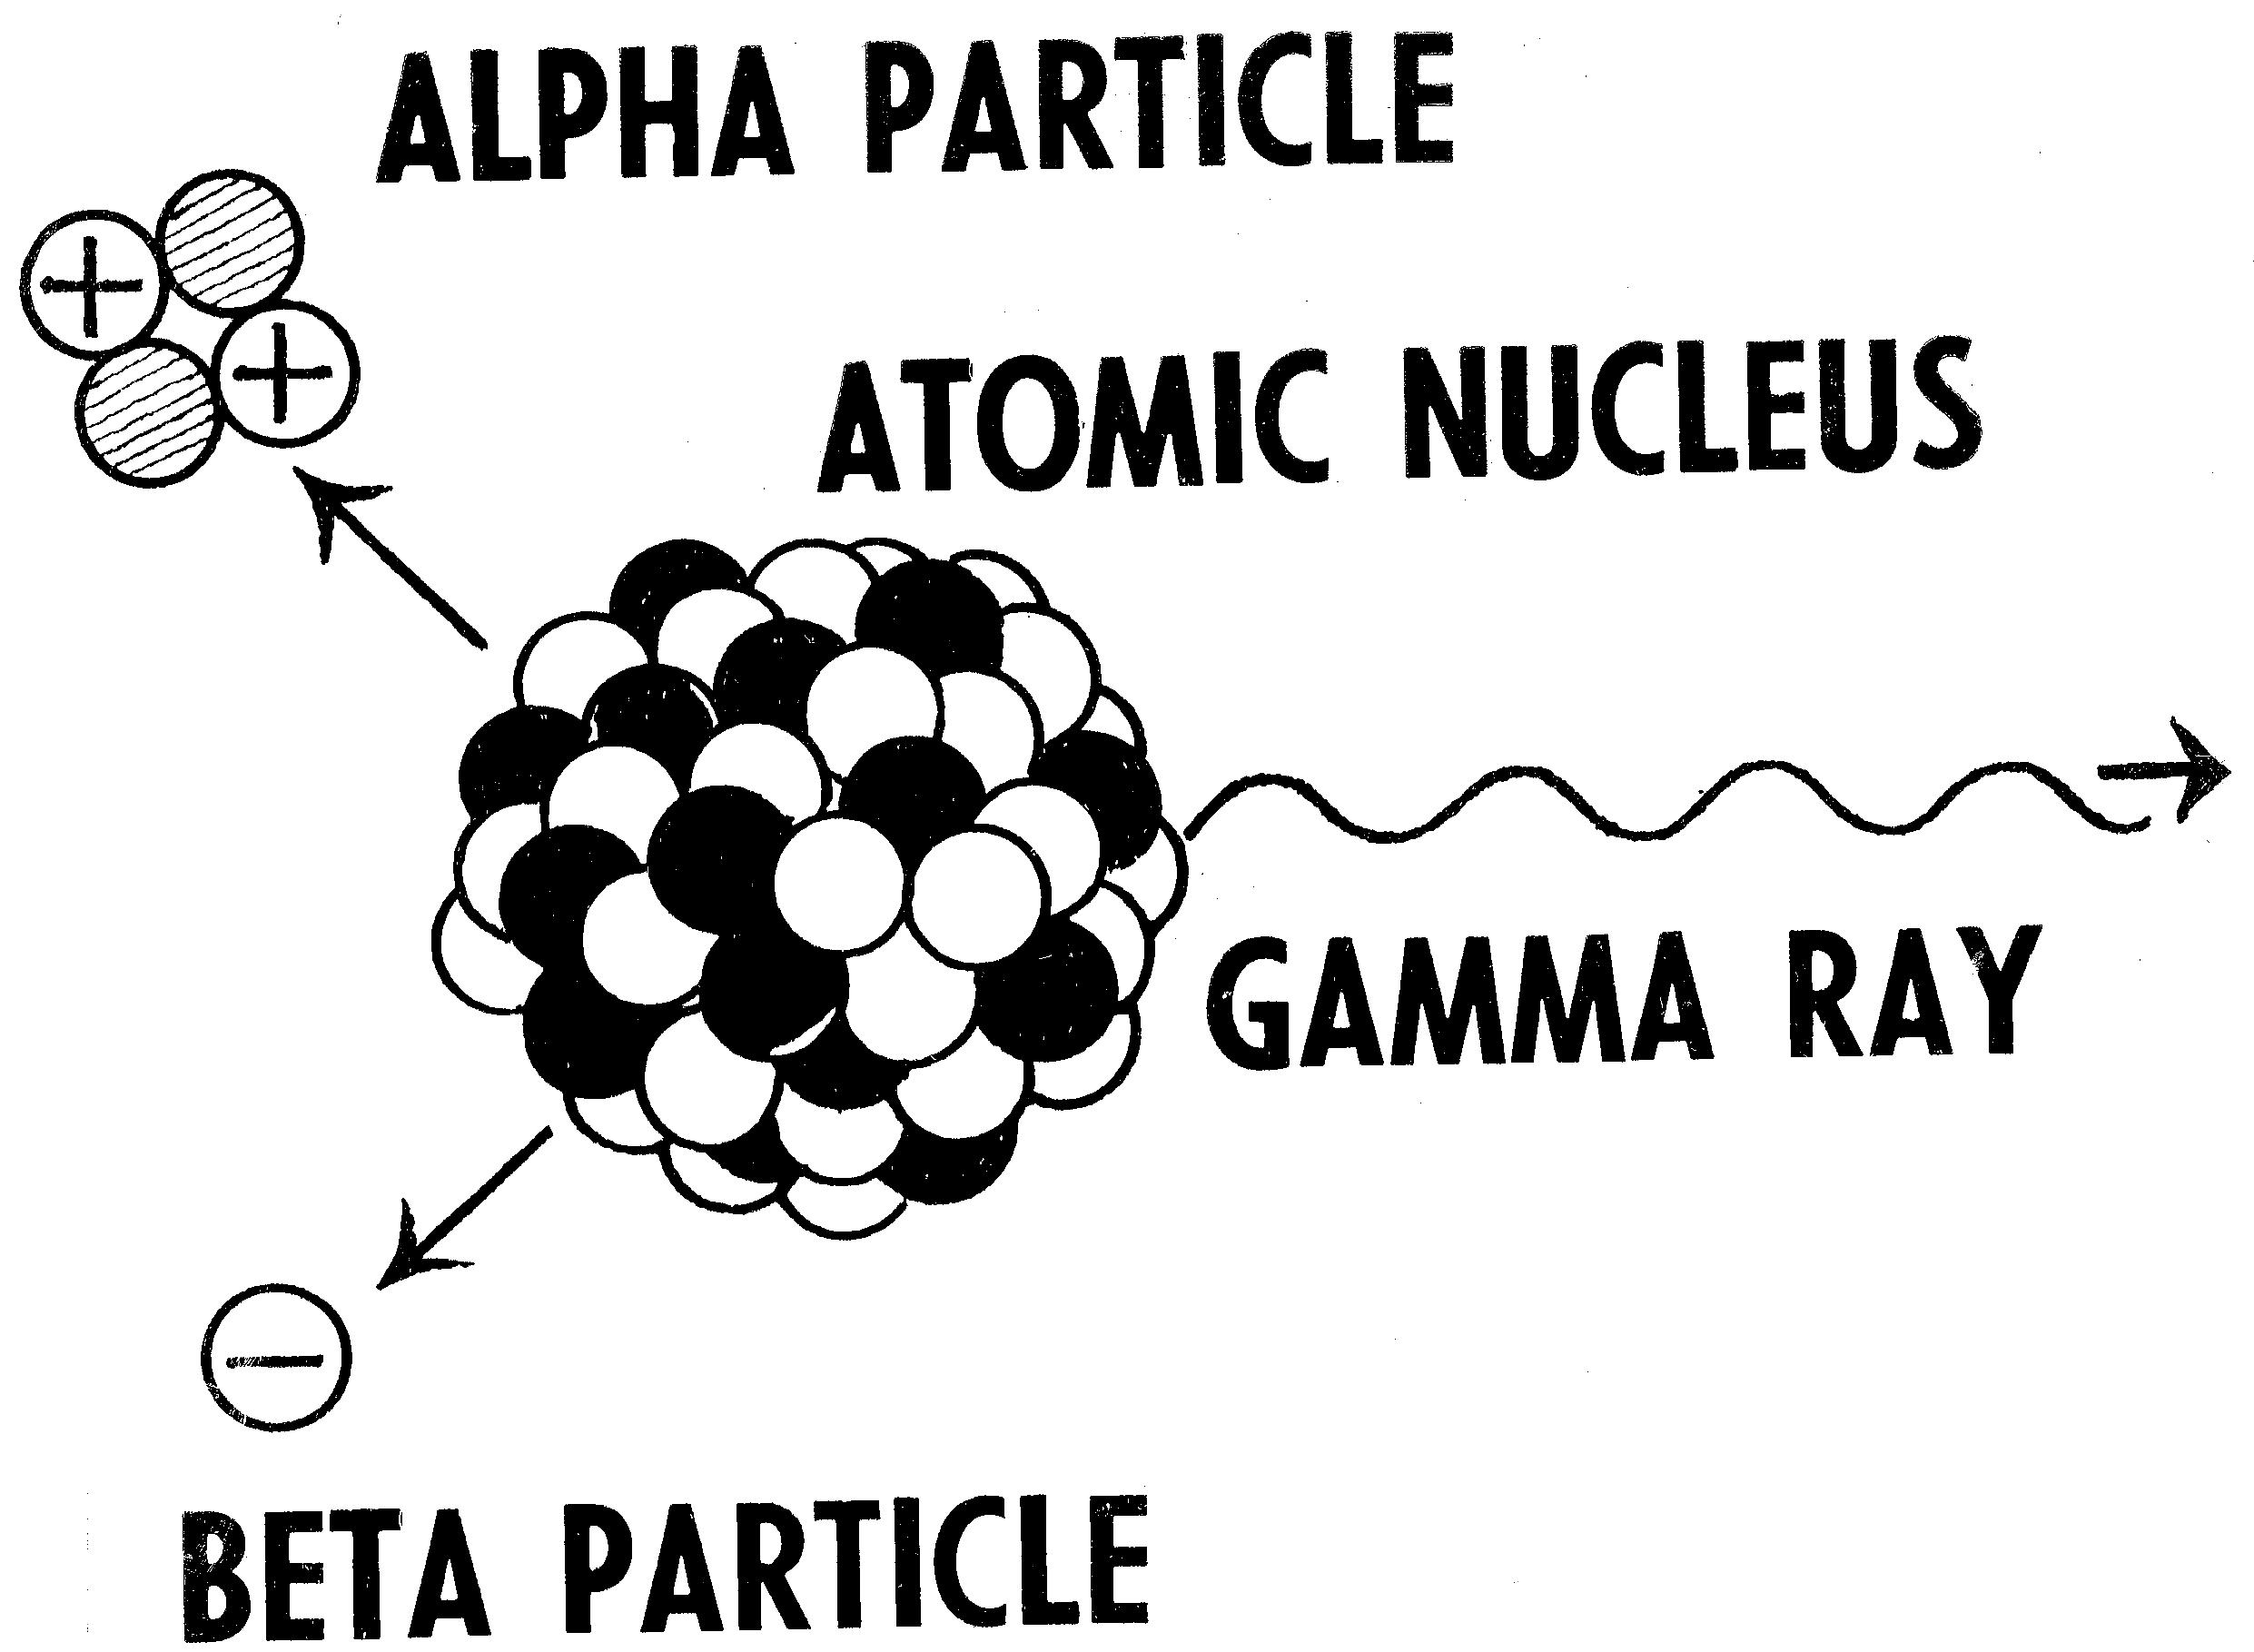 Radioactive elements emit alpha,beta and gama rays